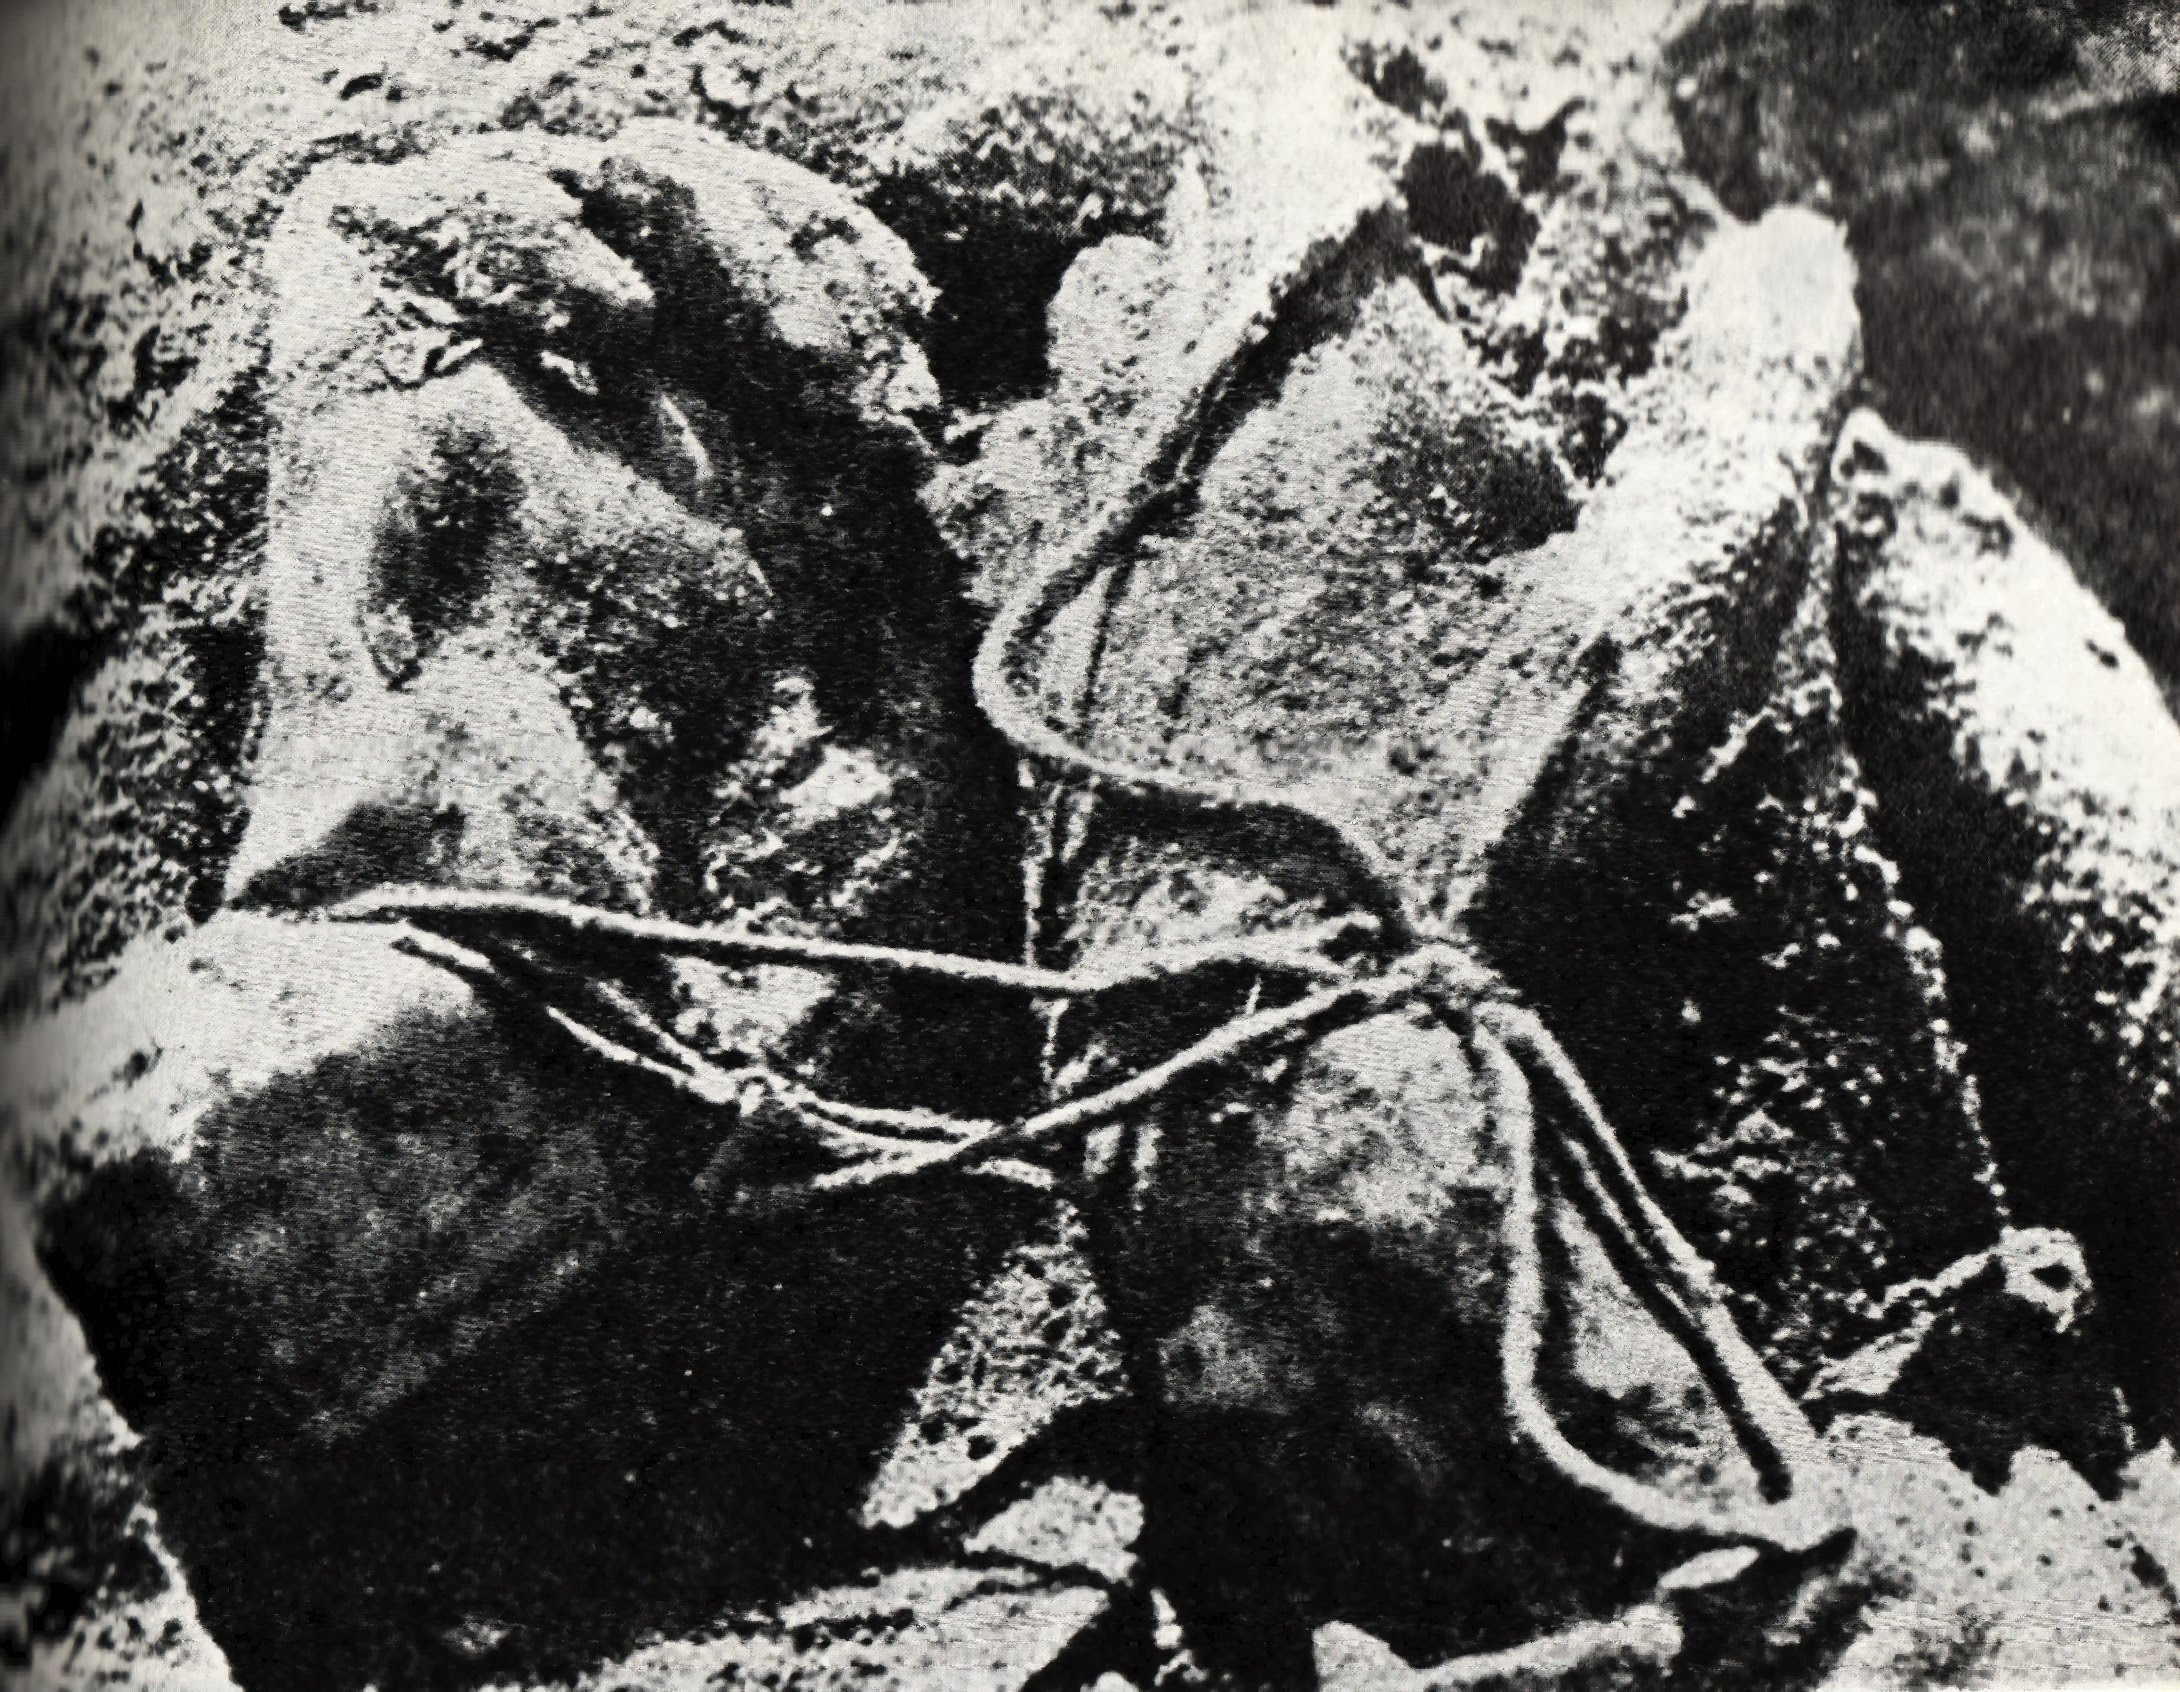 http://upload.wikimedia.org/wikipedia/commons/8/8c/Katyn_massacre.jpg